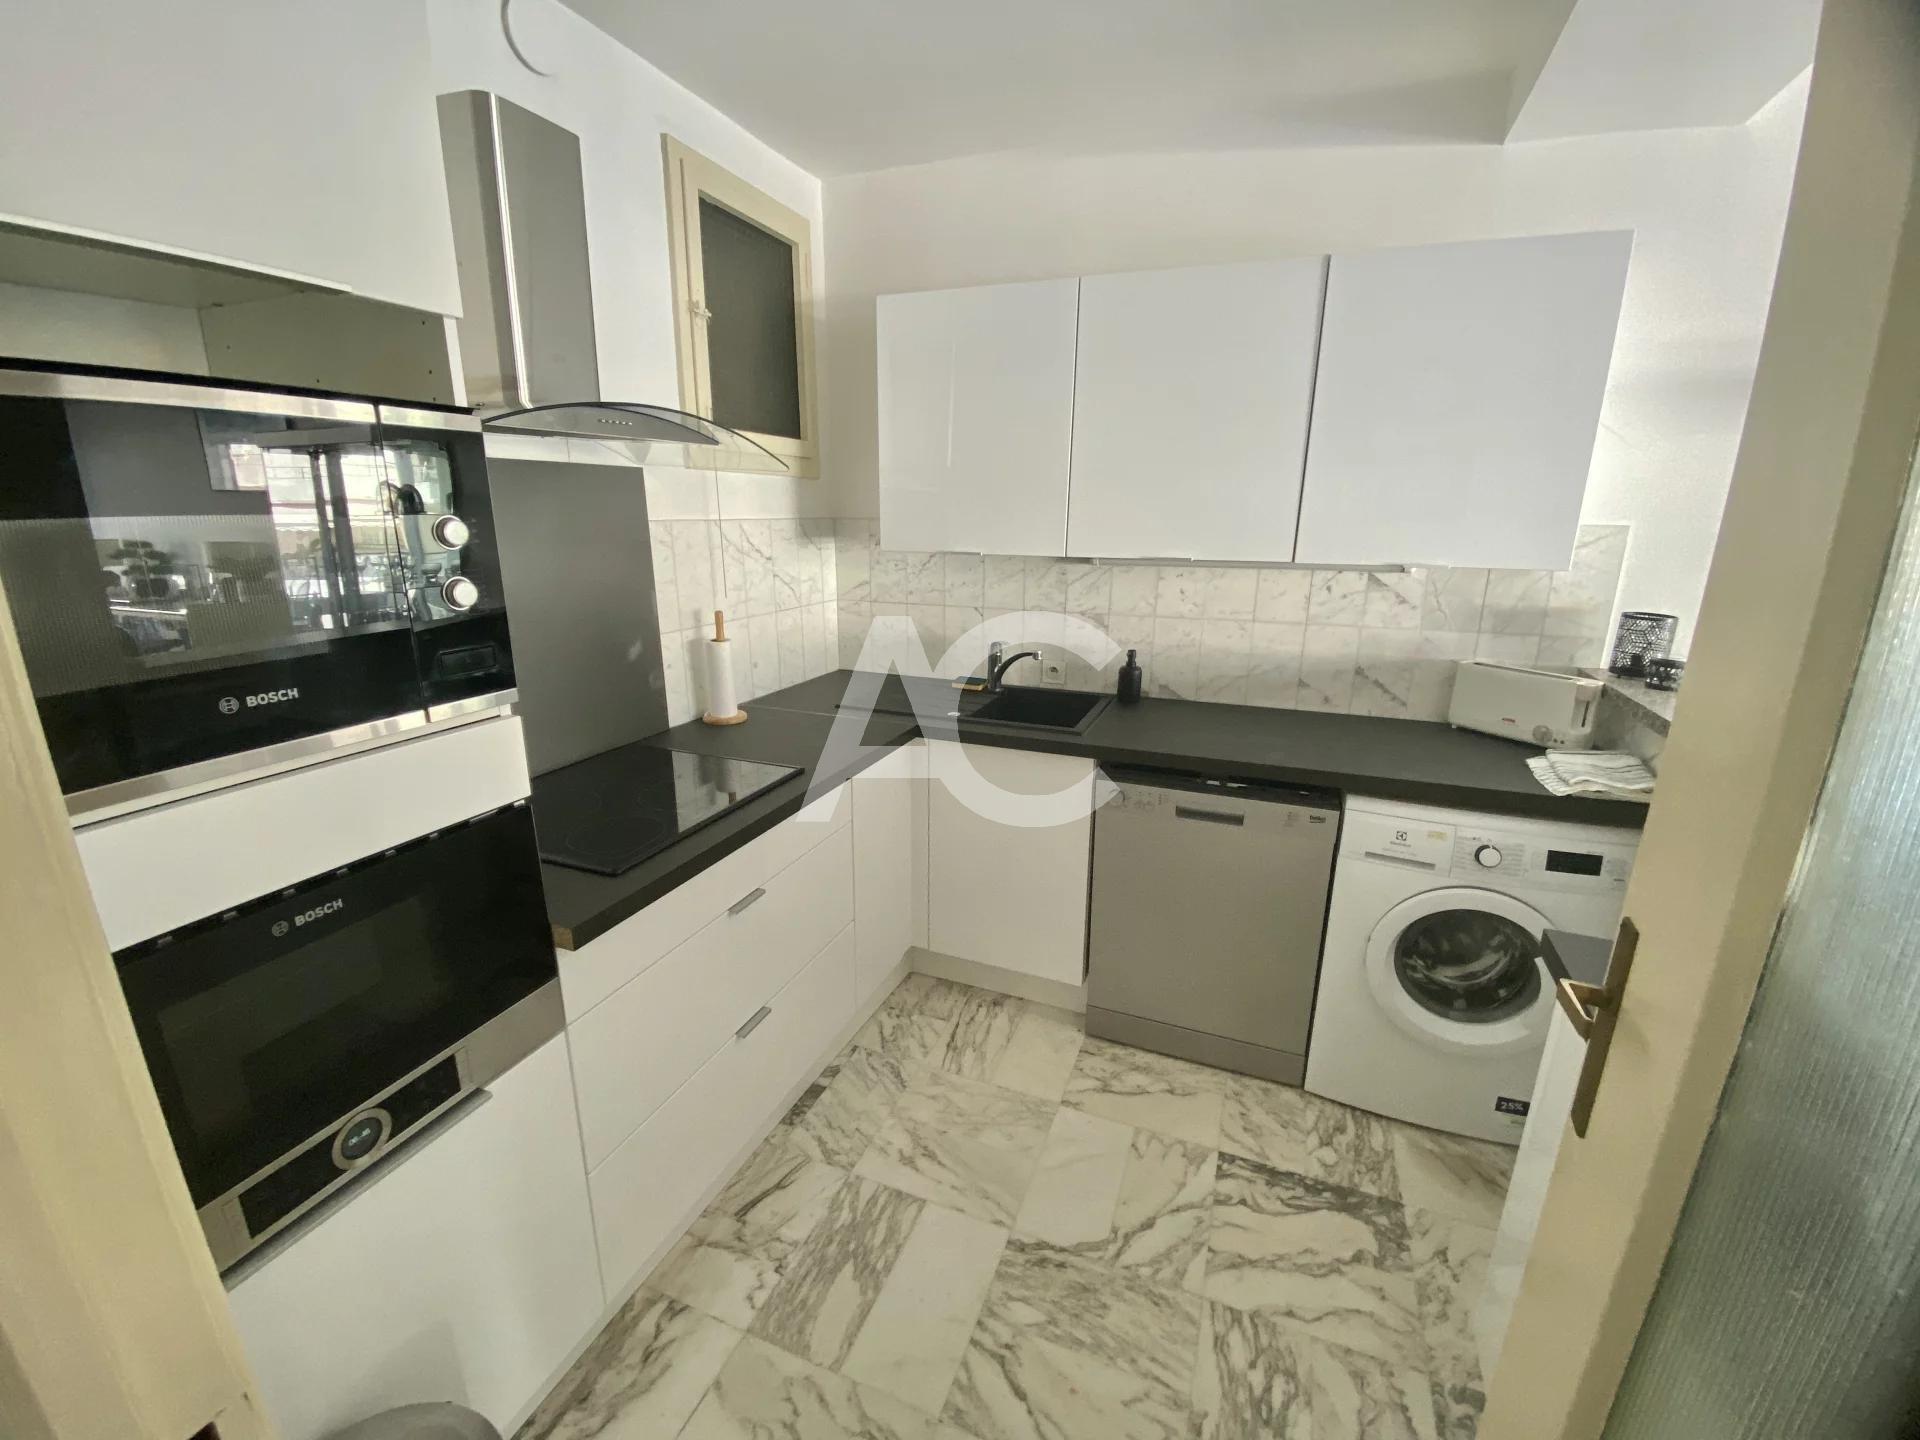 Просторная трехкомнатная квартира - Центр Жуан-ле-Пен